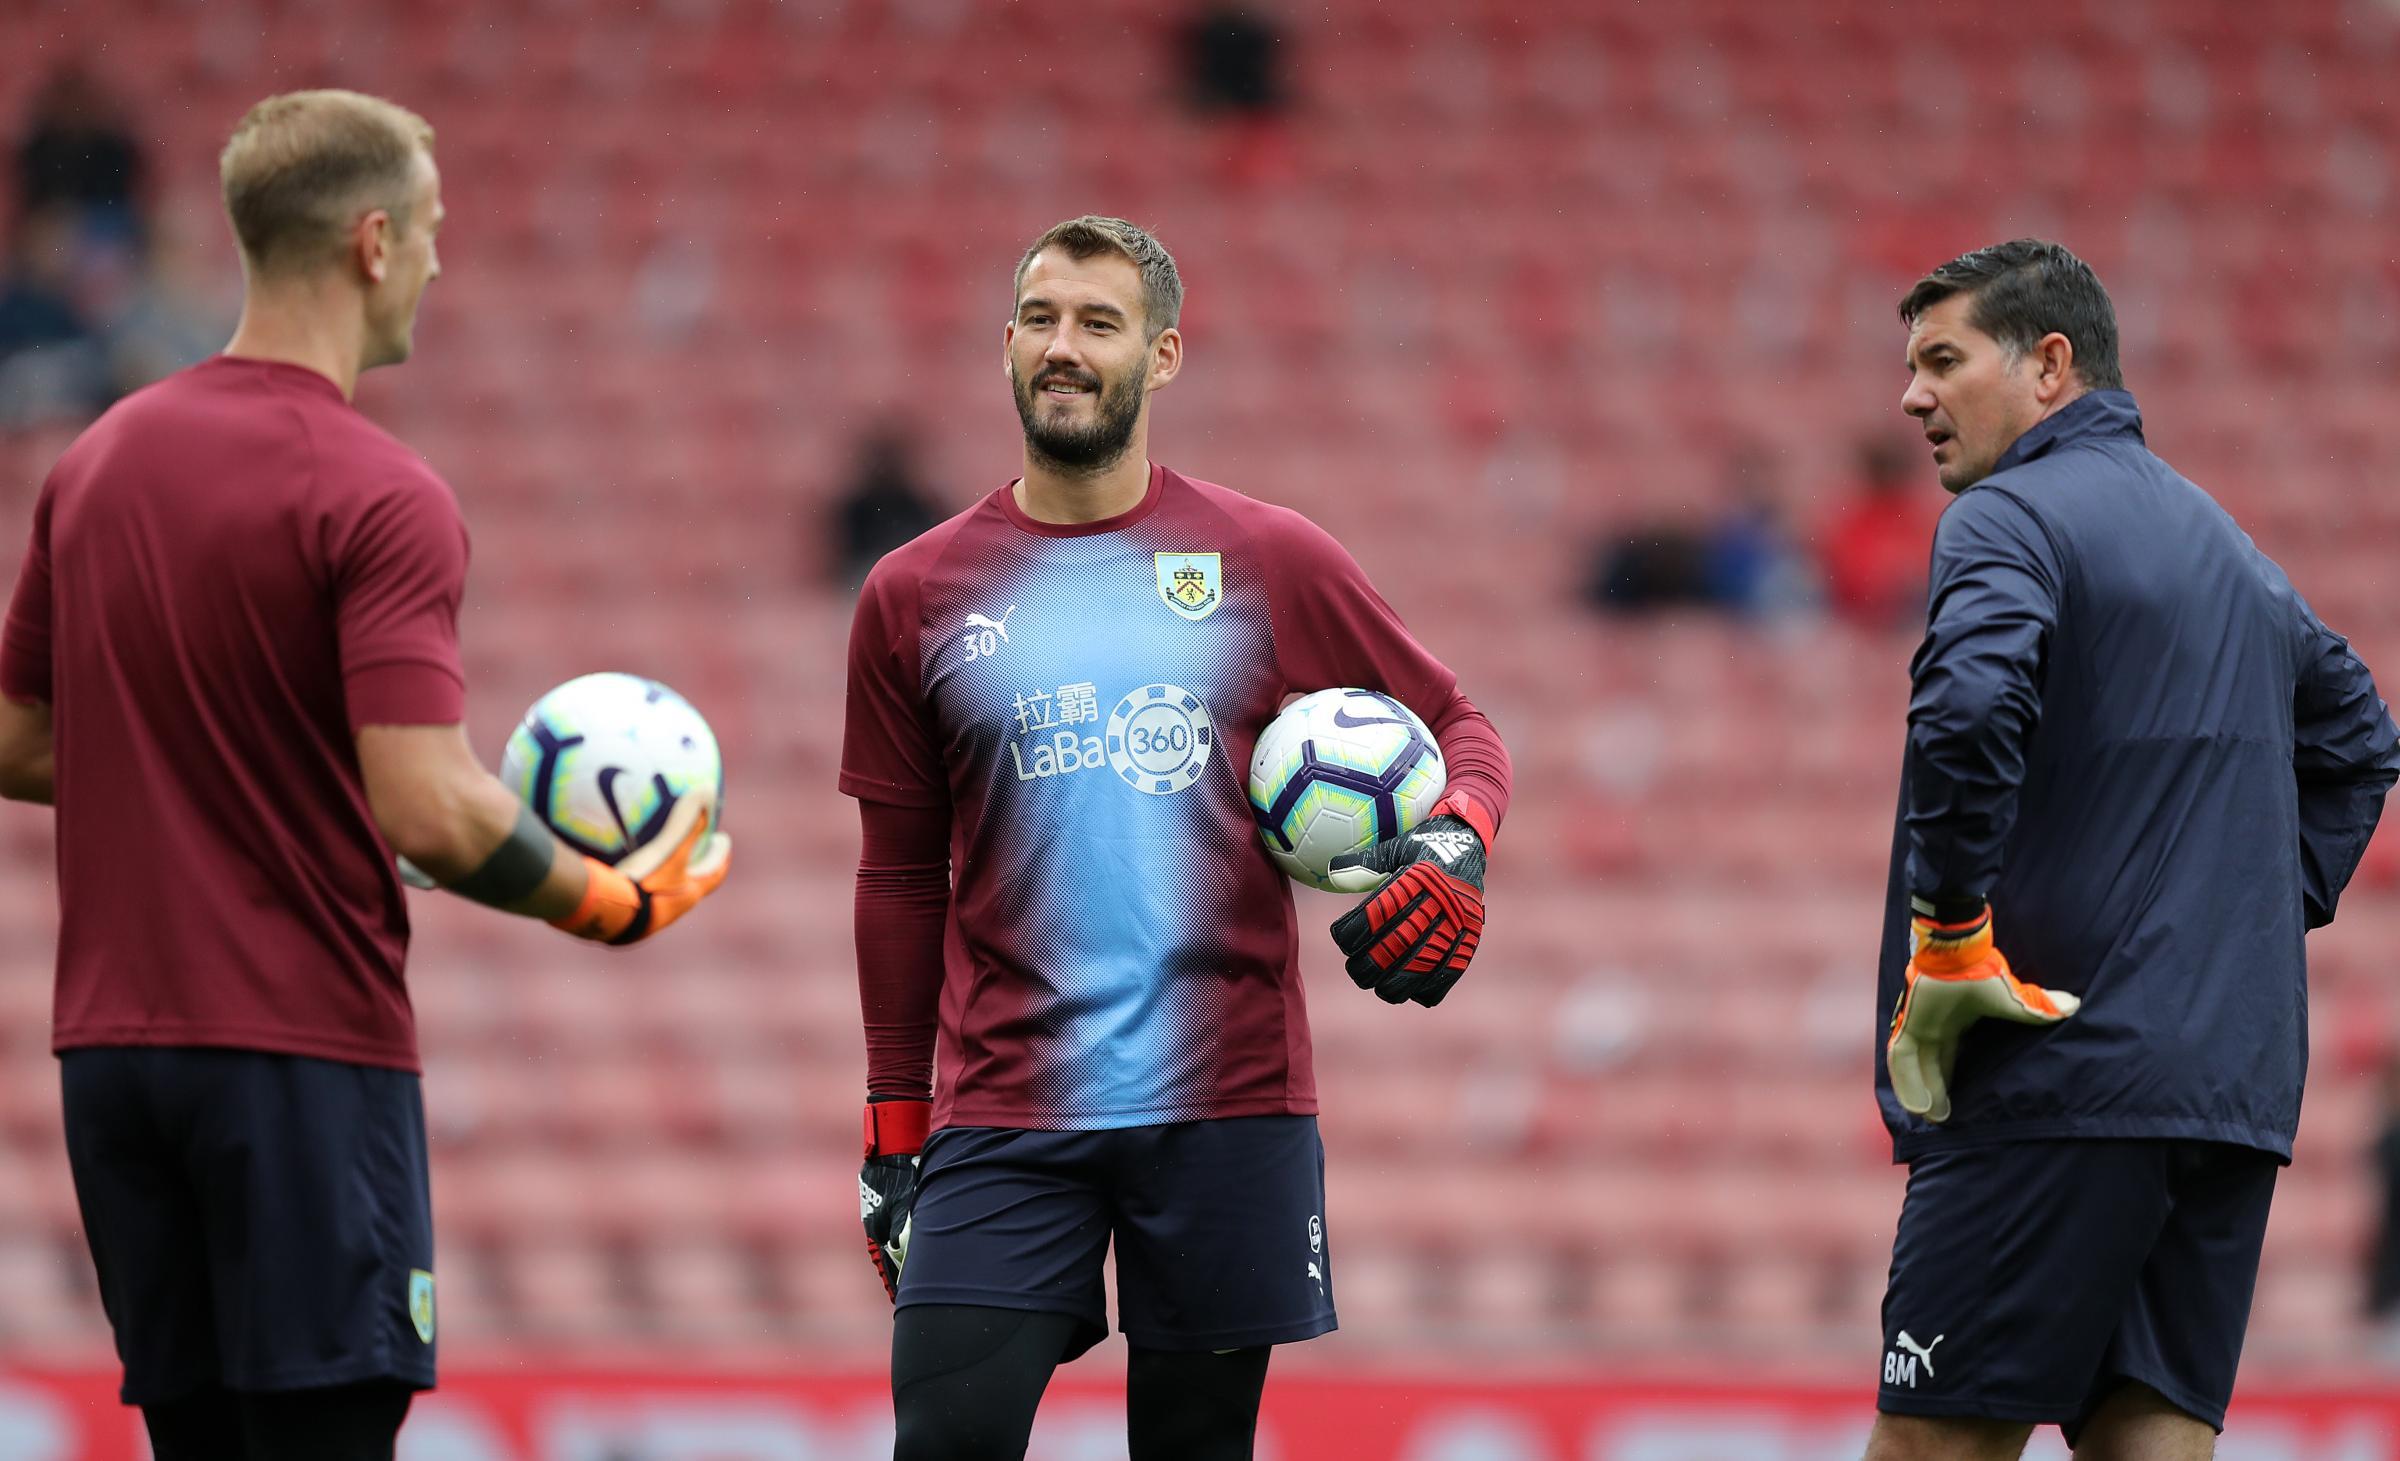 Burnley goalkeeper scores dramatic late Under-23s equaliser